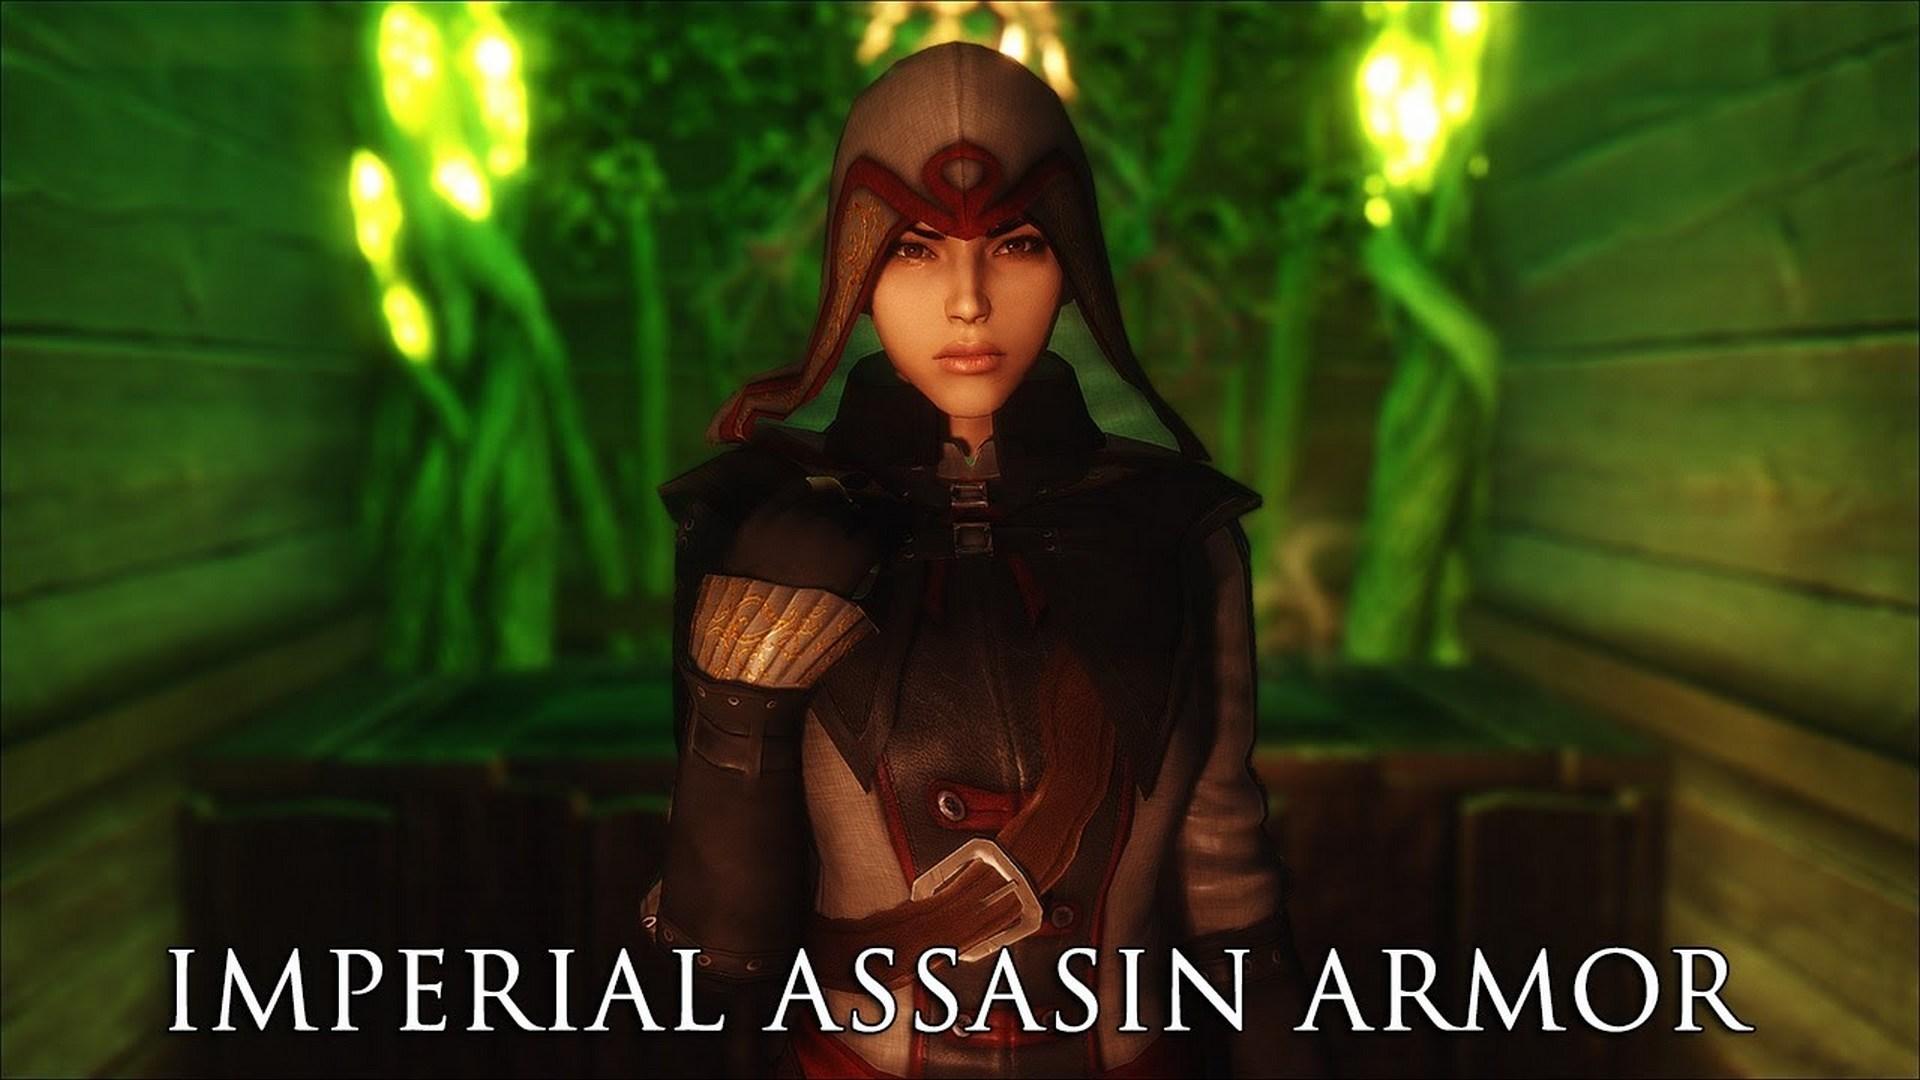 Imperial_Assasin_Armor.jpg